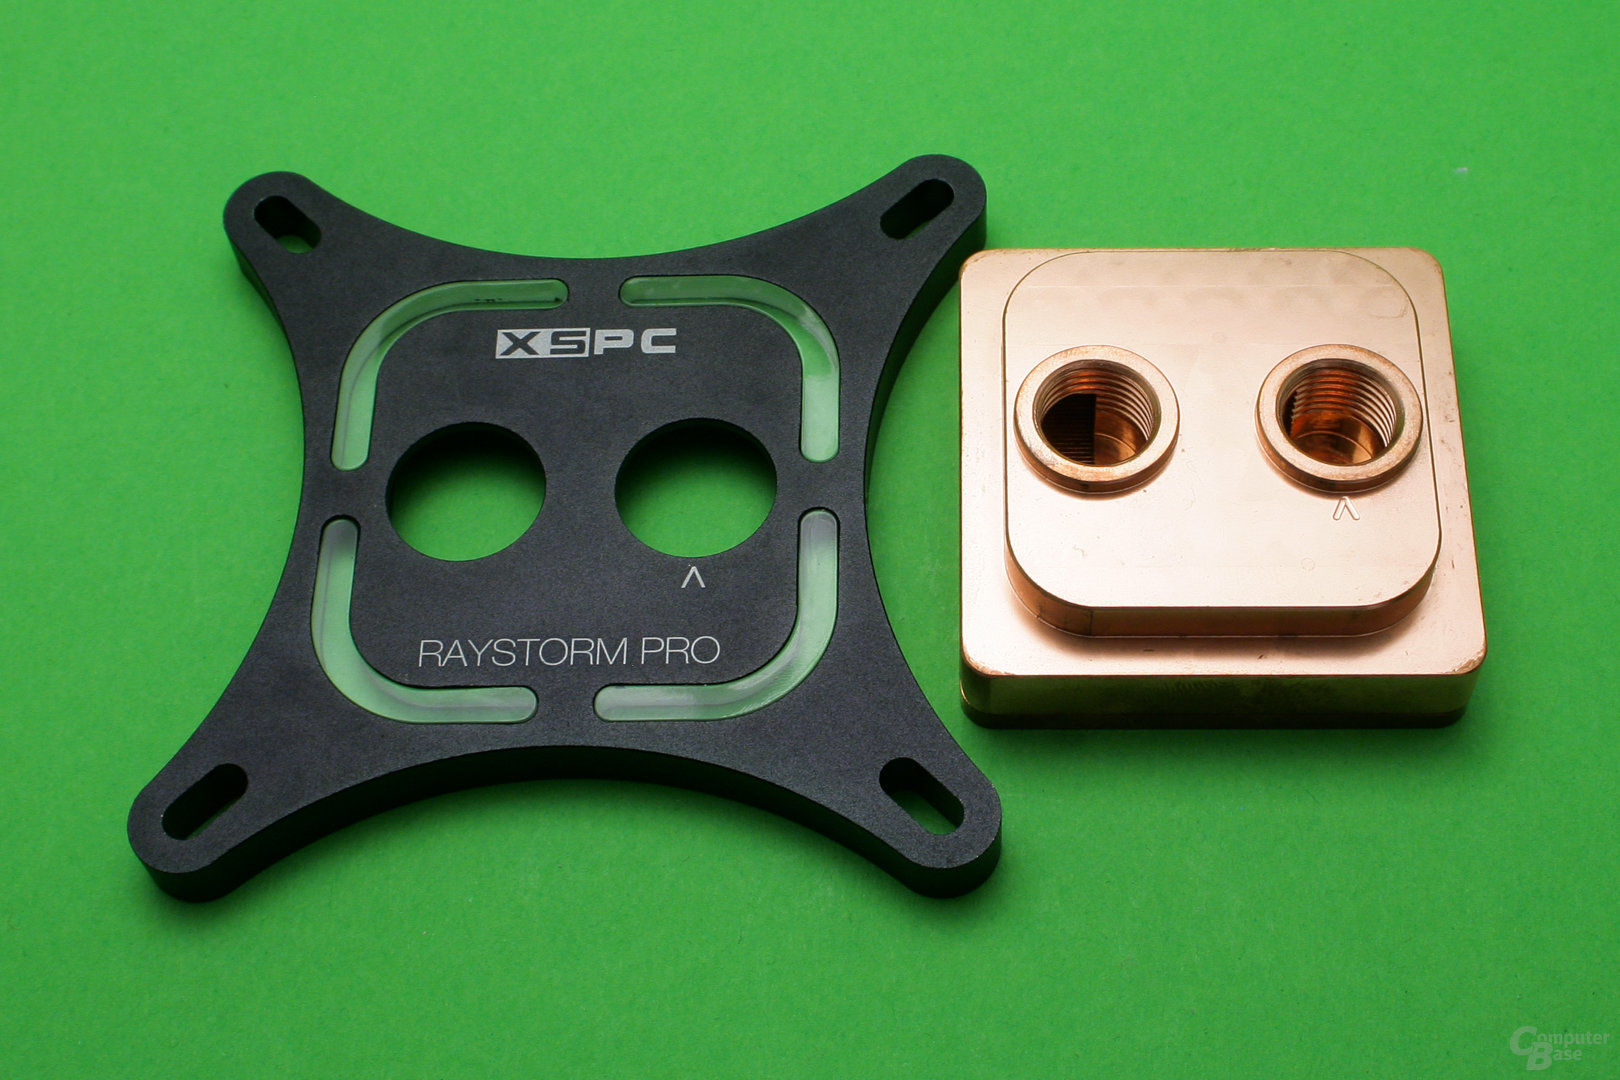 XSPC Raystorm Pro: Montagerahmen ist nicht fixiert